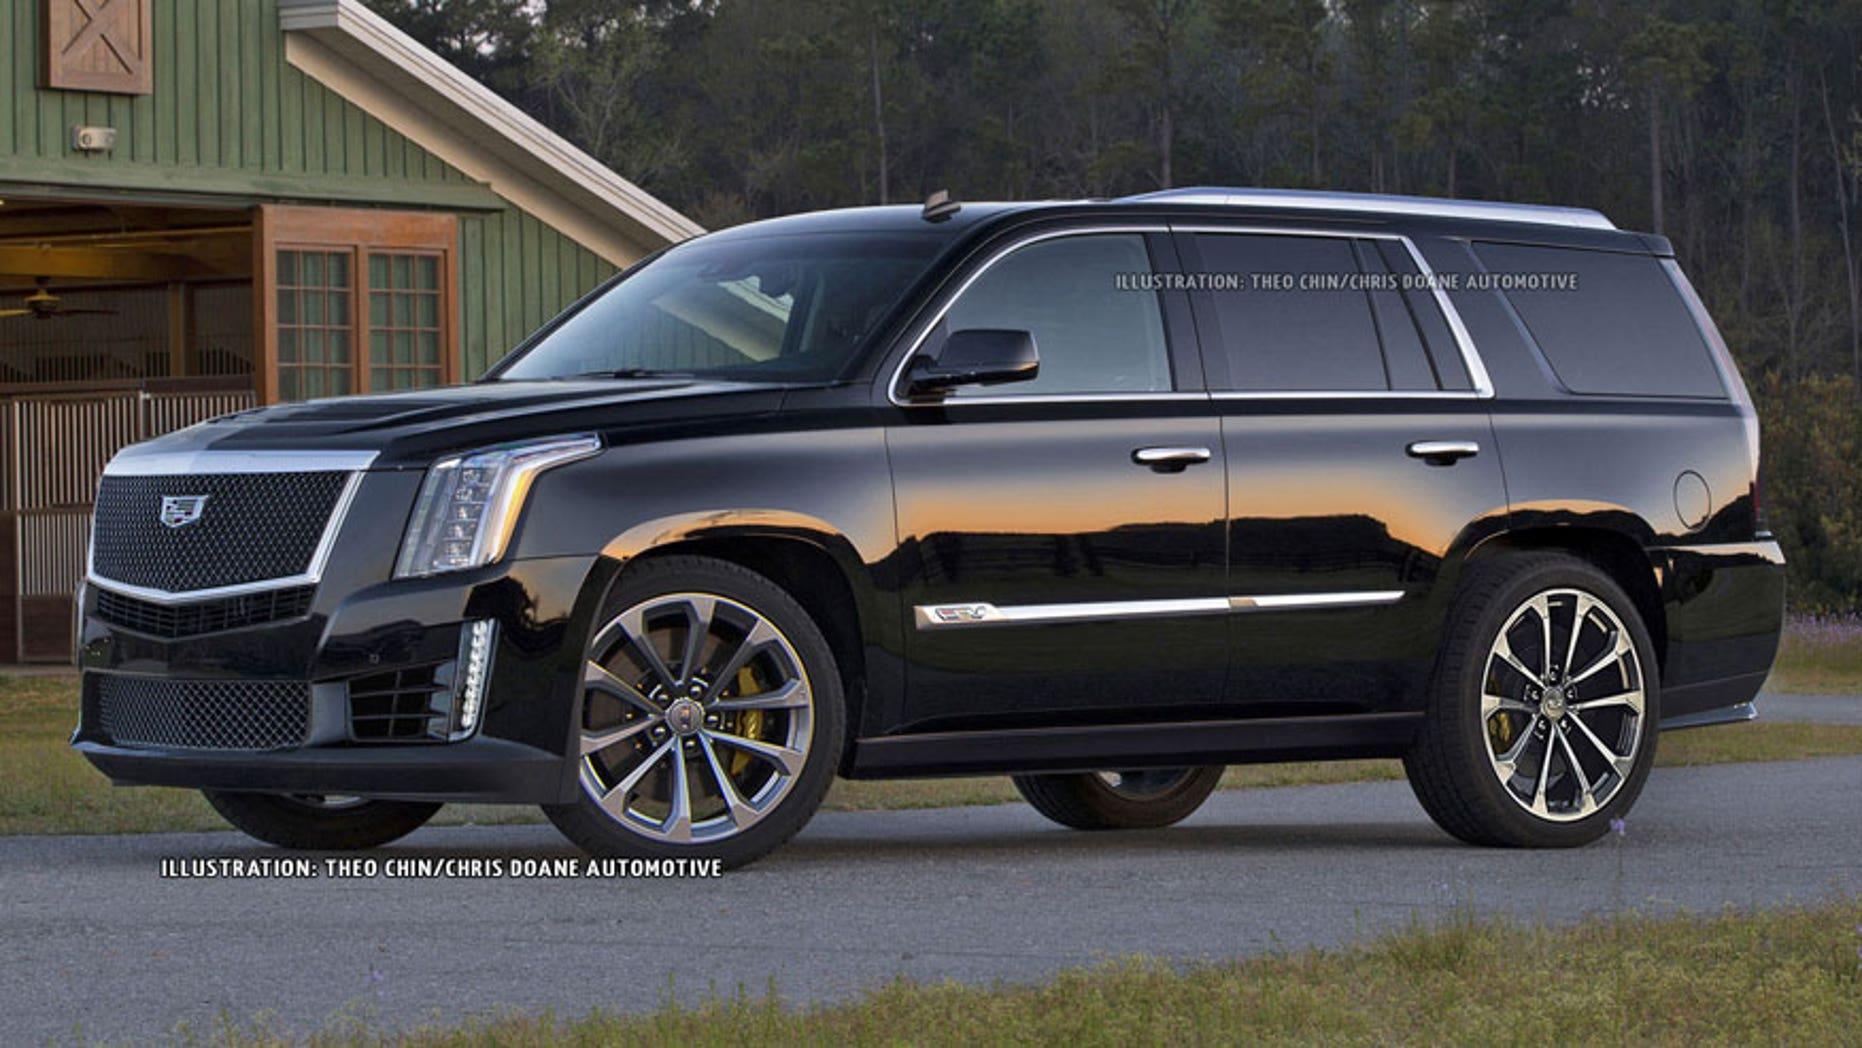 Cadillac considering introducing $100,000-plus Escalade ...